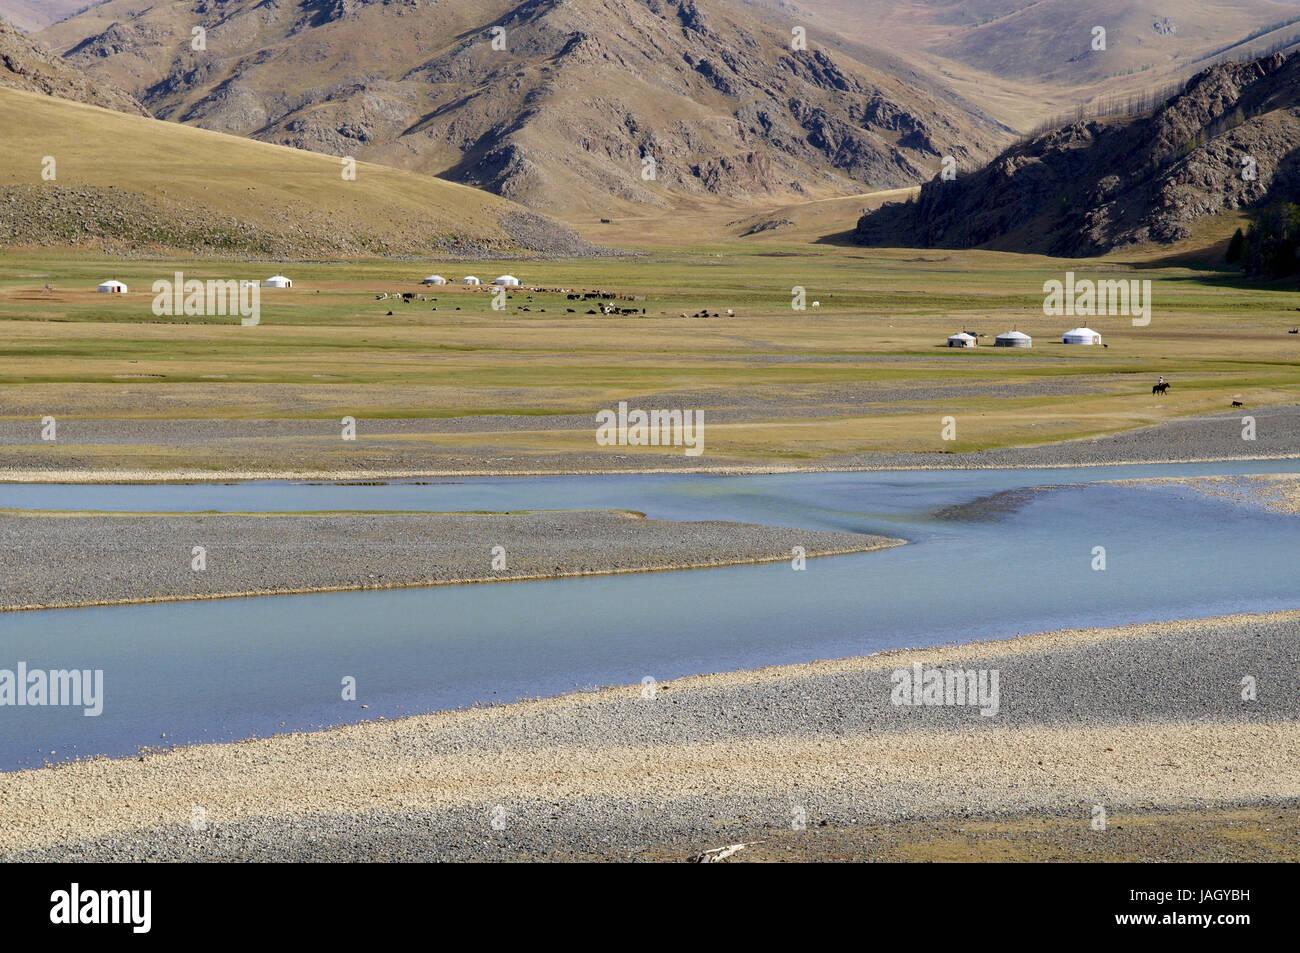 Mongolia,Central Asia,Ovorkhangai province,historical Orkhon valley,UNESCO world heritage,Orkhon flux,nomad,support,Jurten, Stock Photo